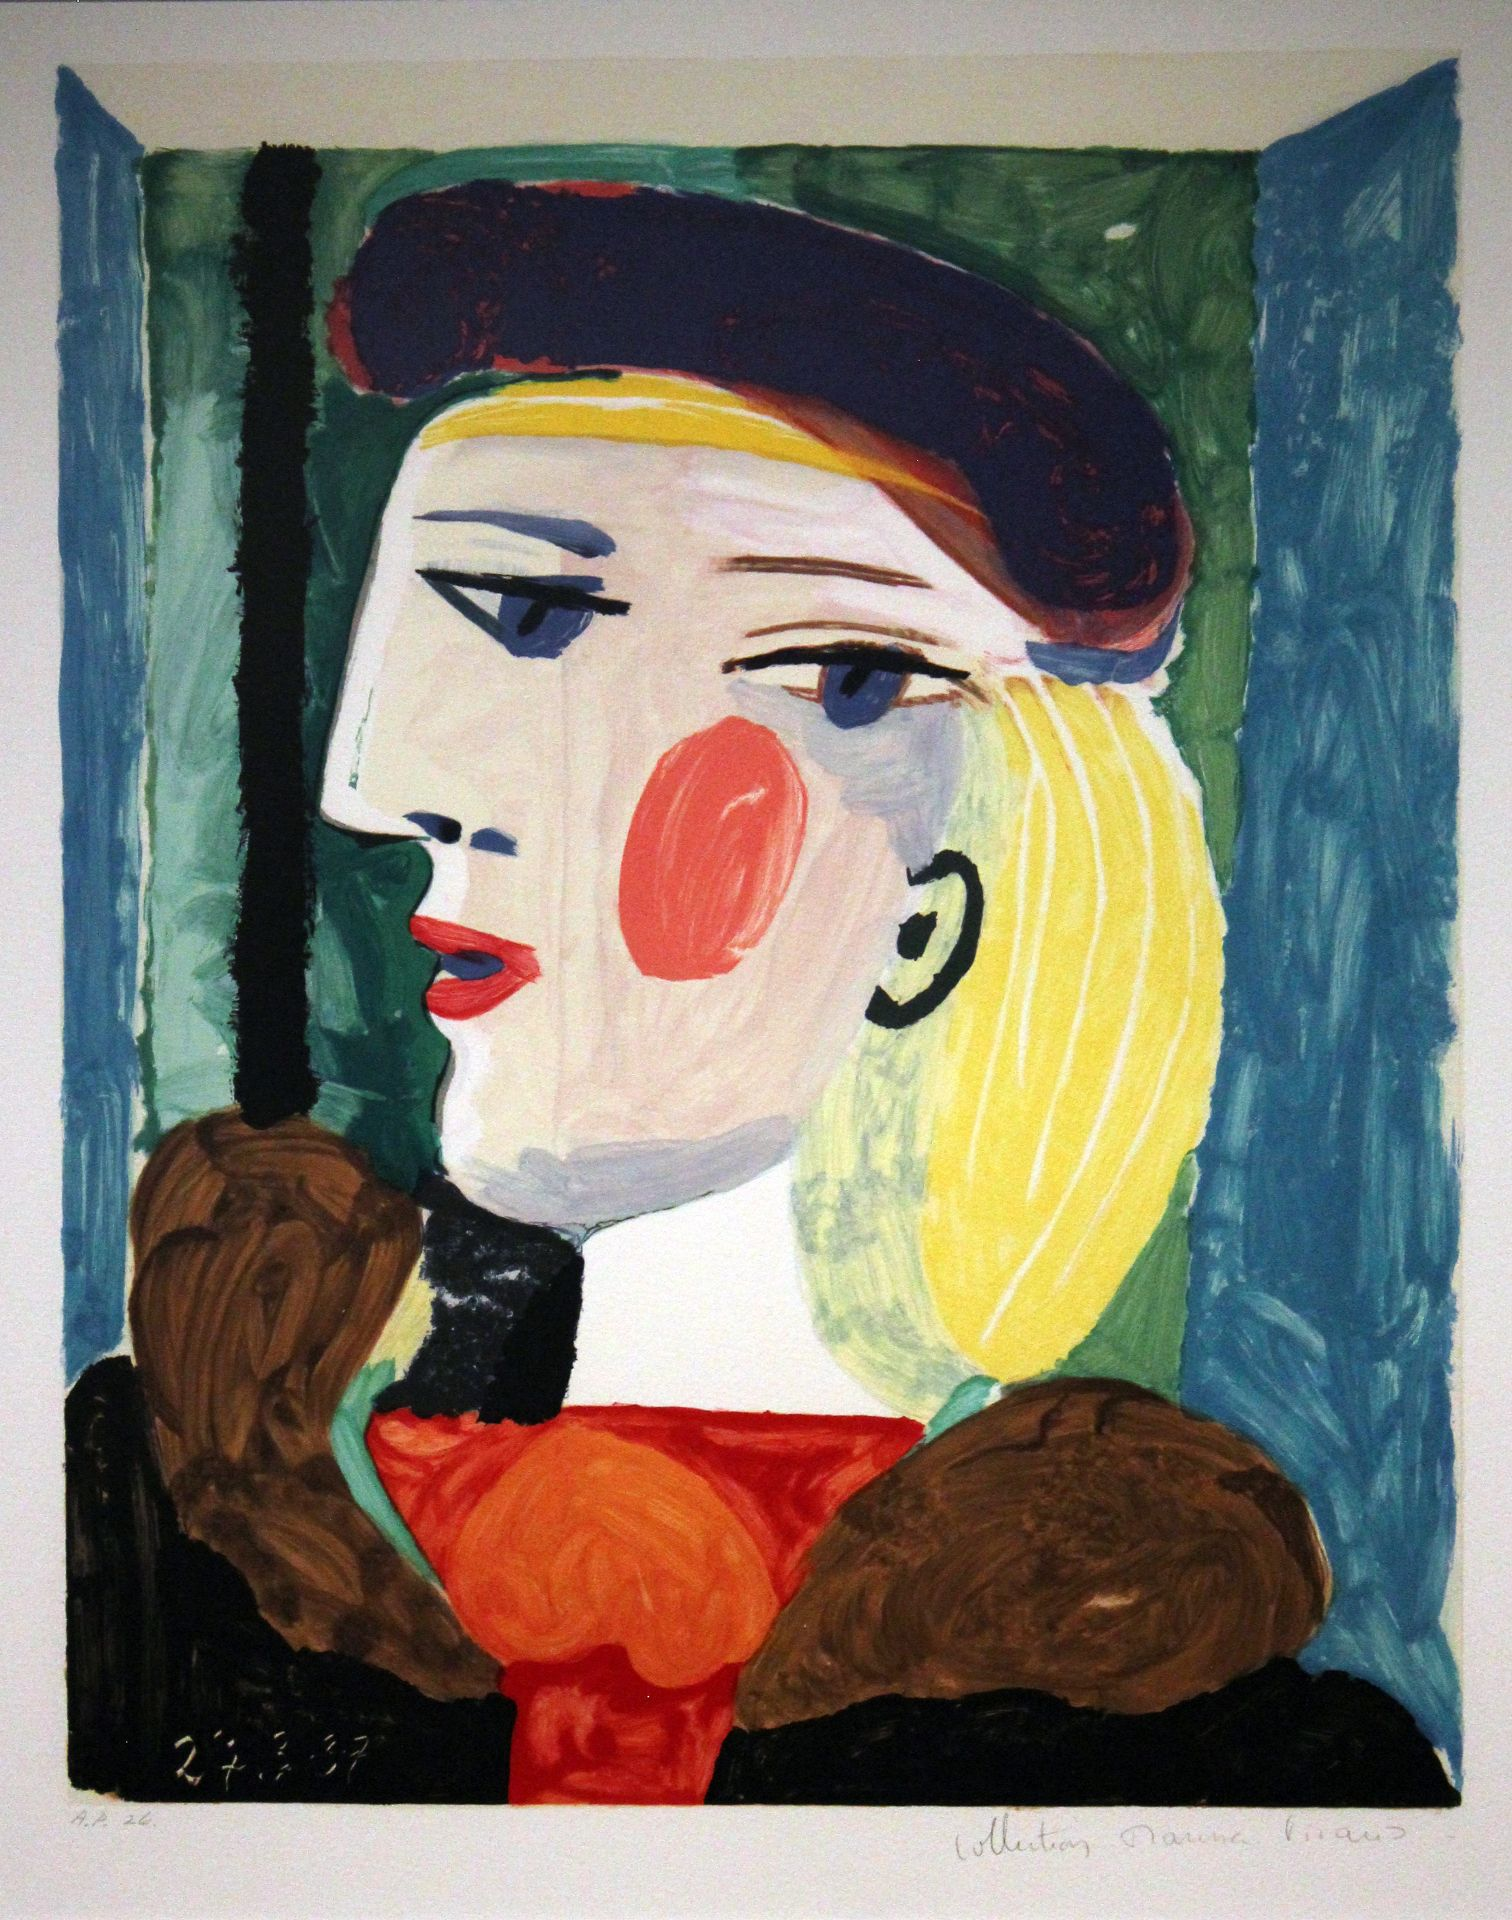 abstract art portatit of face